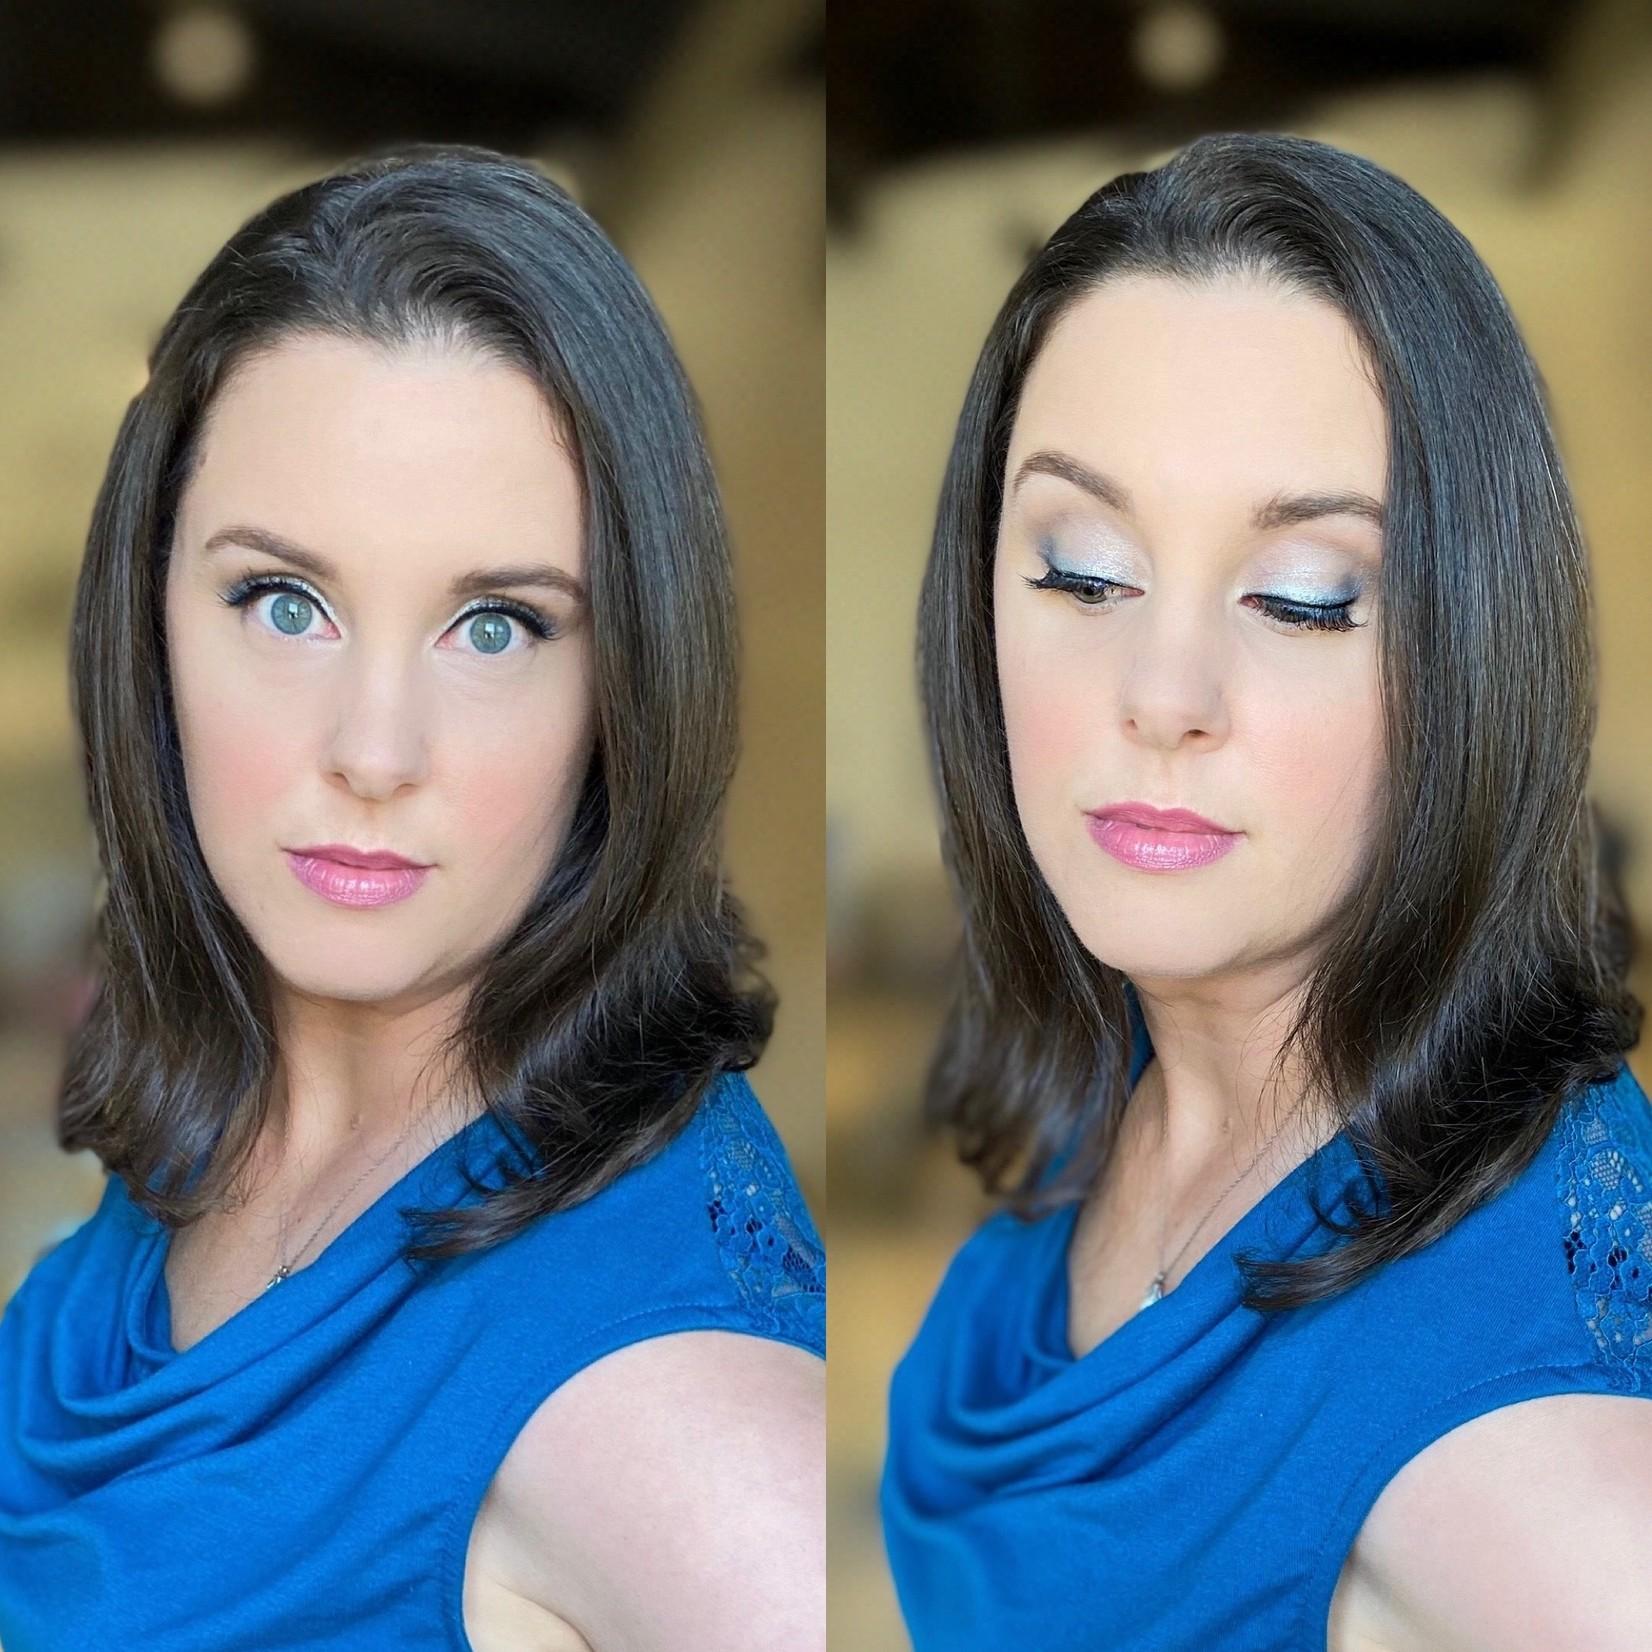 JKC SHOP BY EYE - Deep Brunette/Black Hair + Blue Eyes